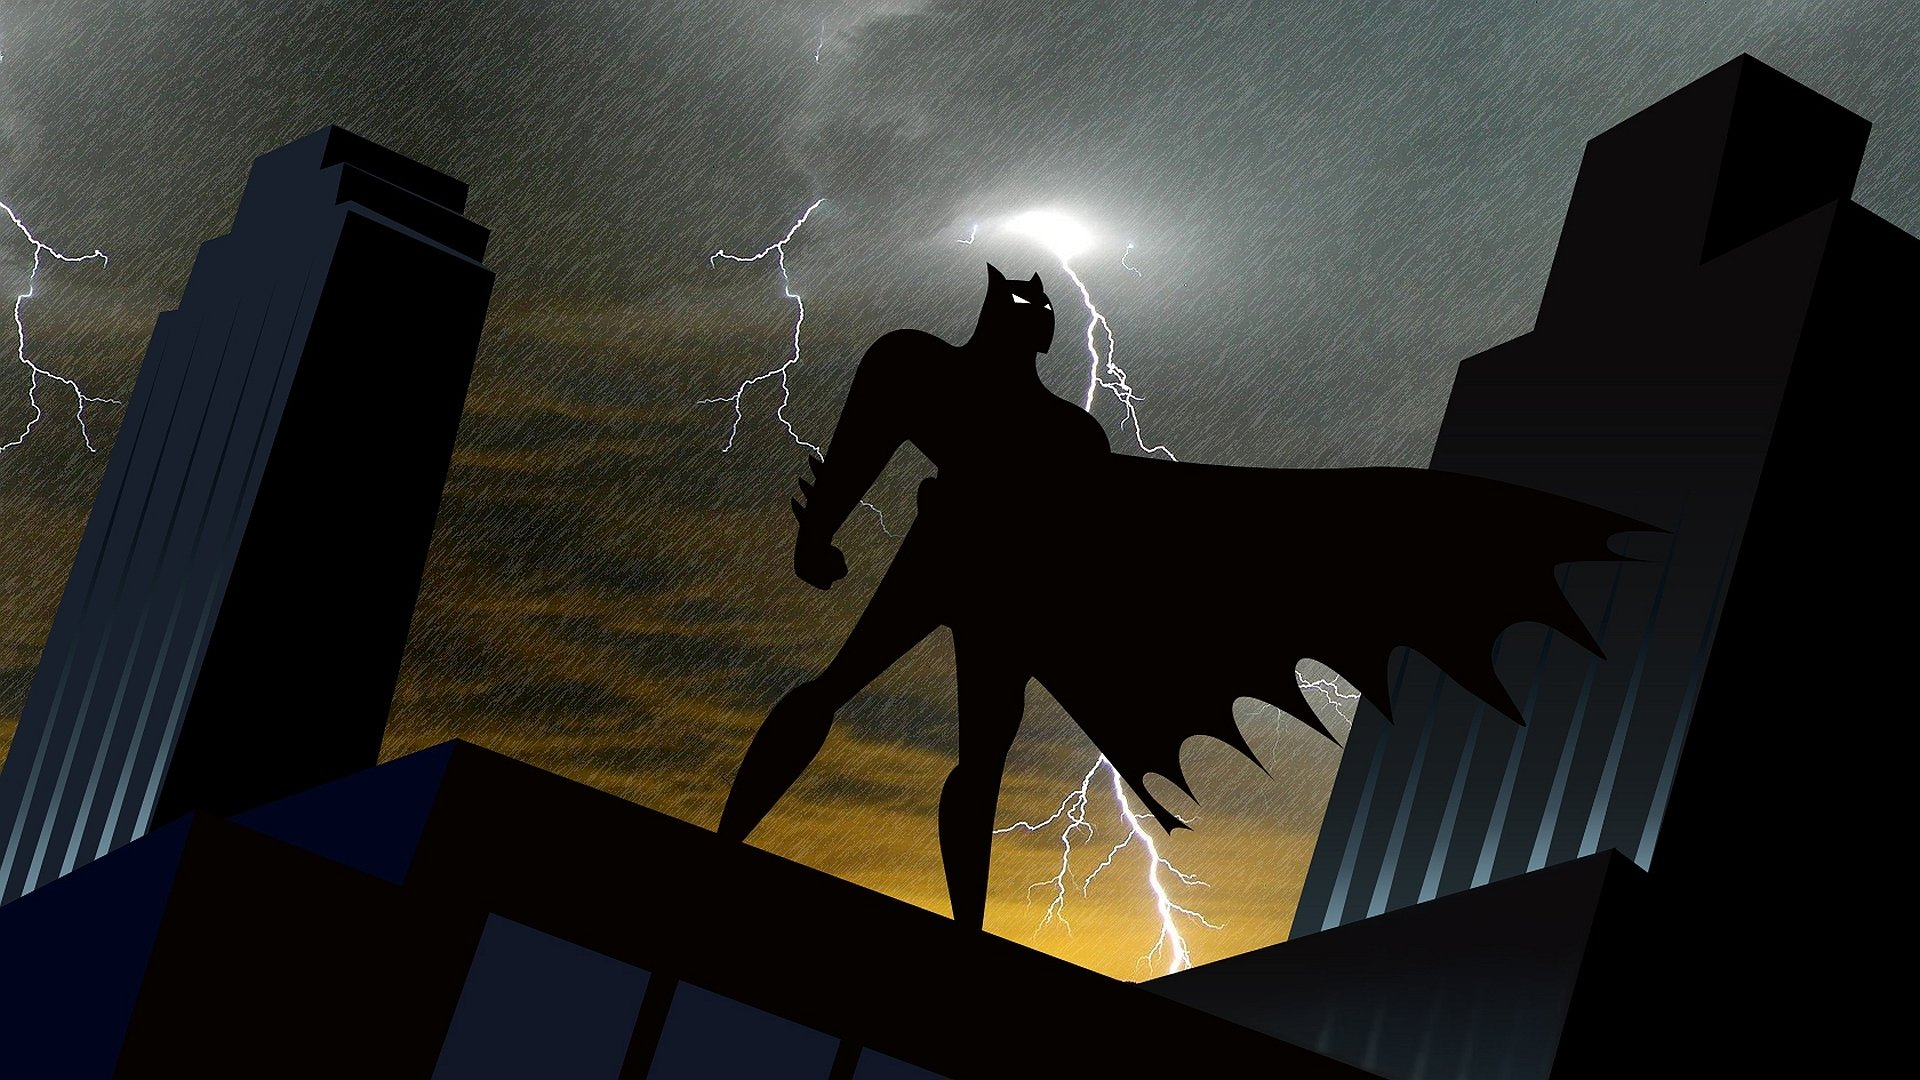 batman: the animated series hd wallpaper | hintergrund | 1920x1080